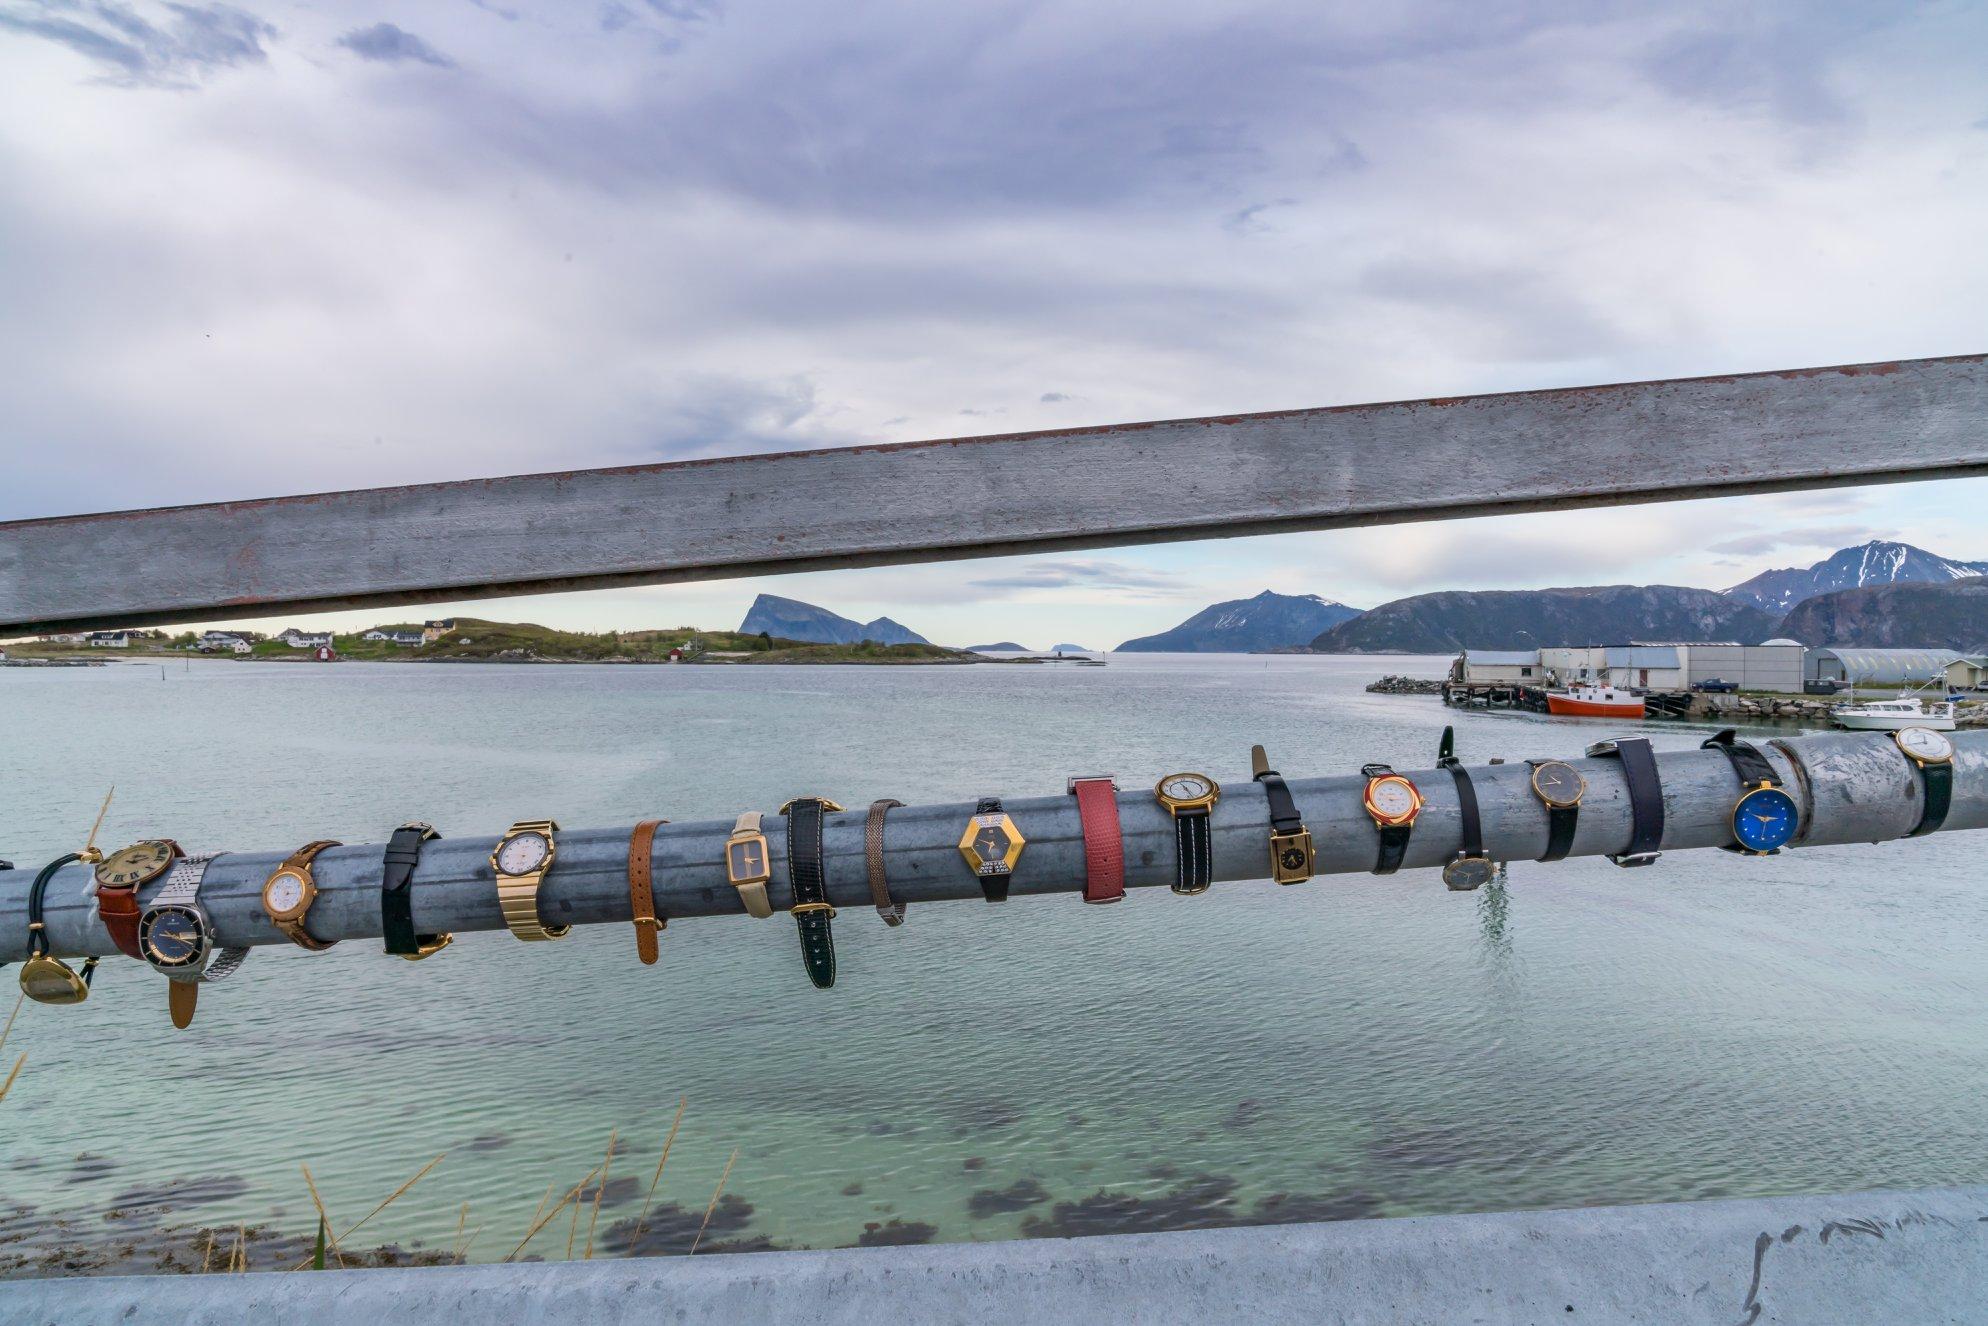 norge, norsk ø, sommertid, tidsfri zone, sommarøy,